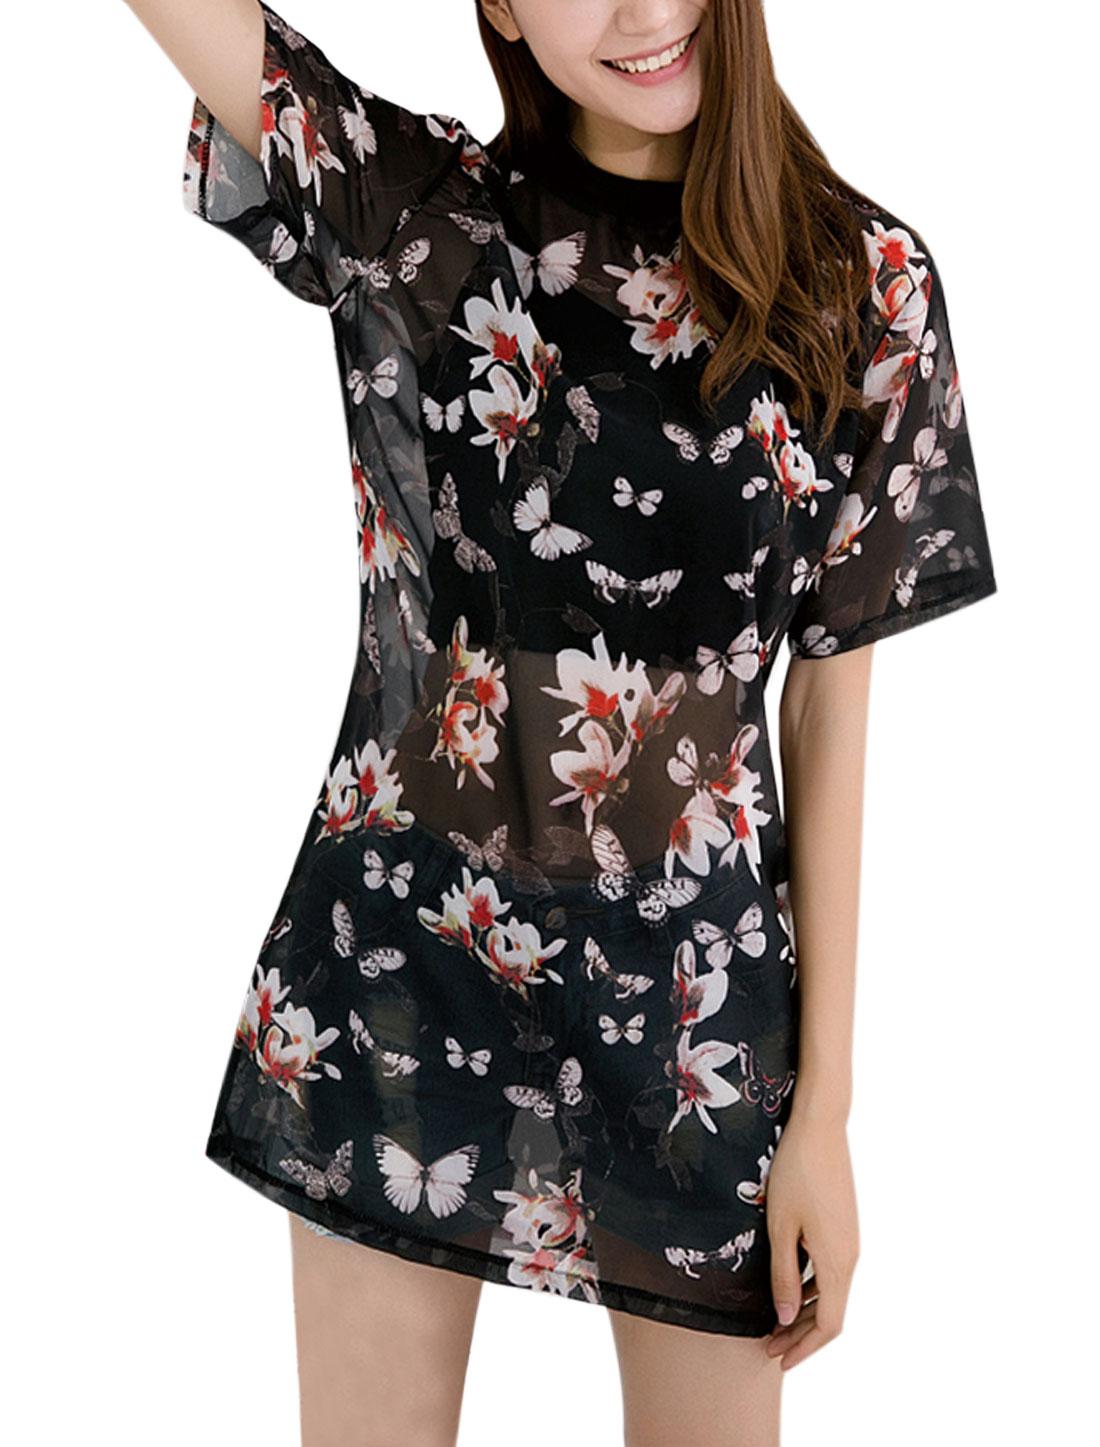 Women Crew Neck Semi Sheer Butterfly Floral Tunic Chiffon Top Black XS